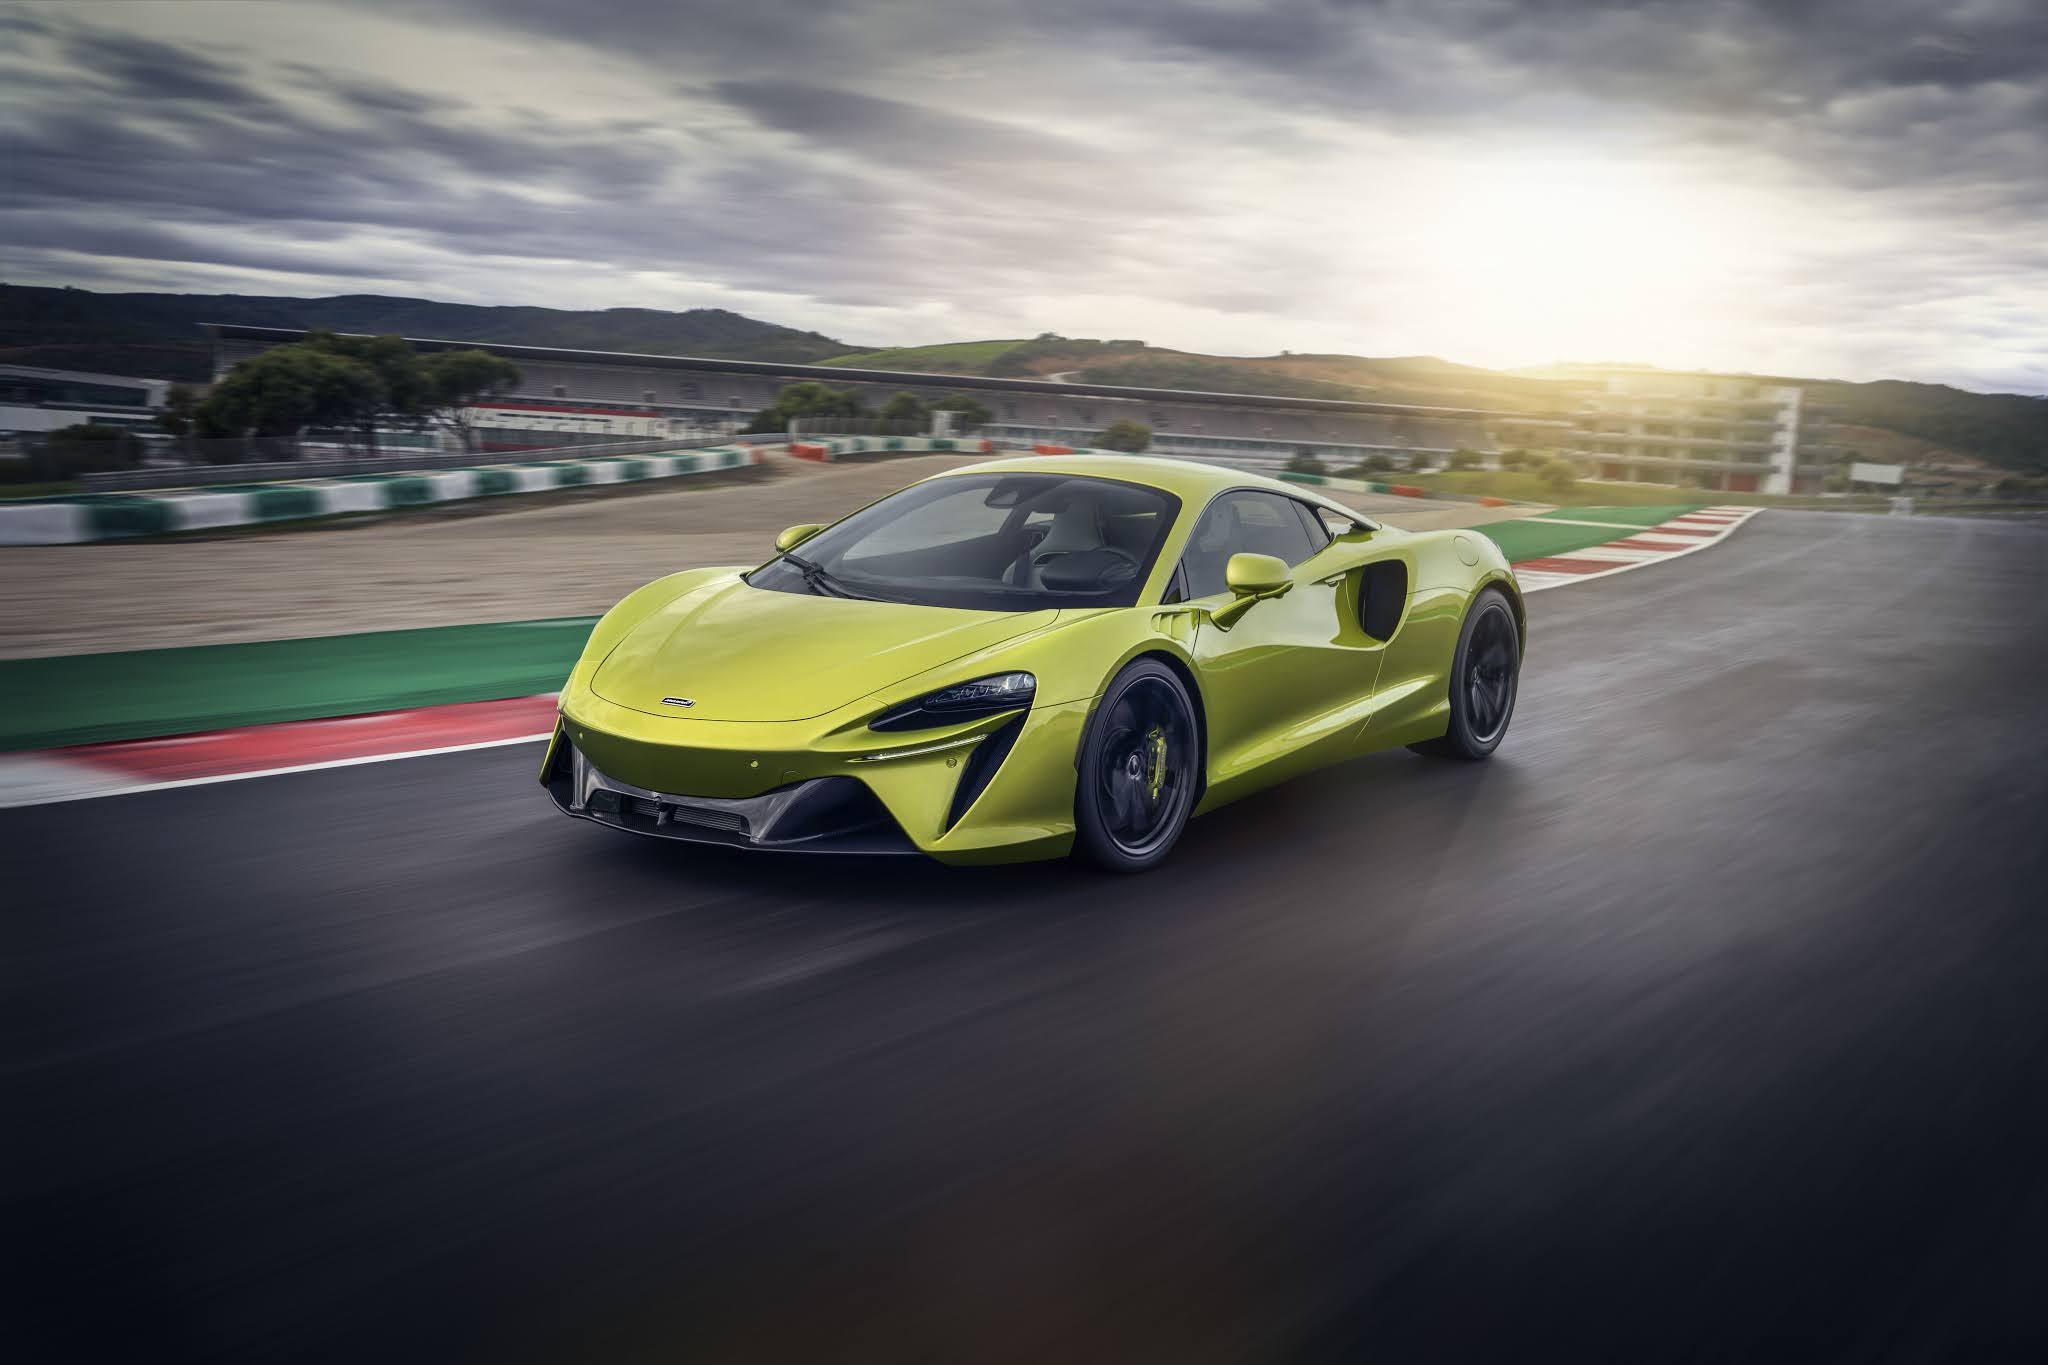 McLaren unveiled Hybrid supercar in Bahrain